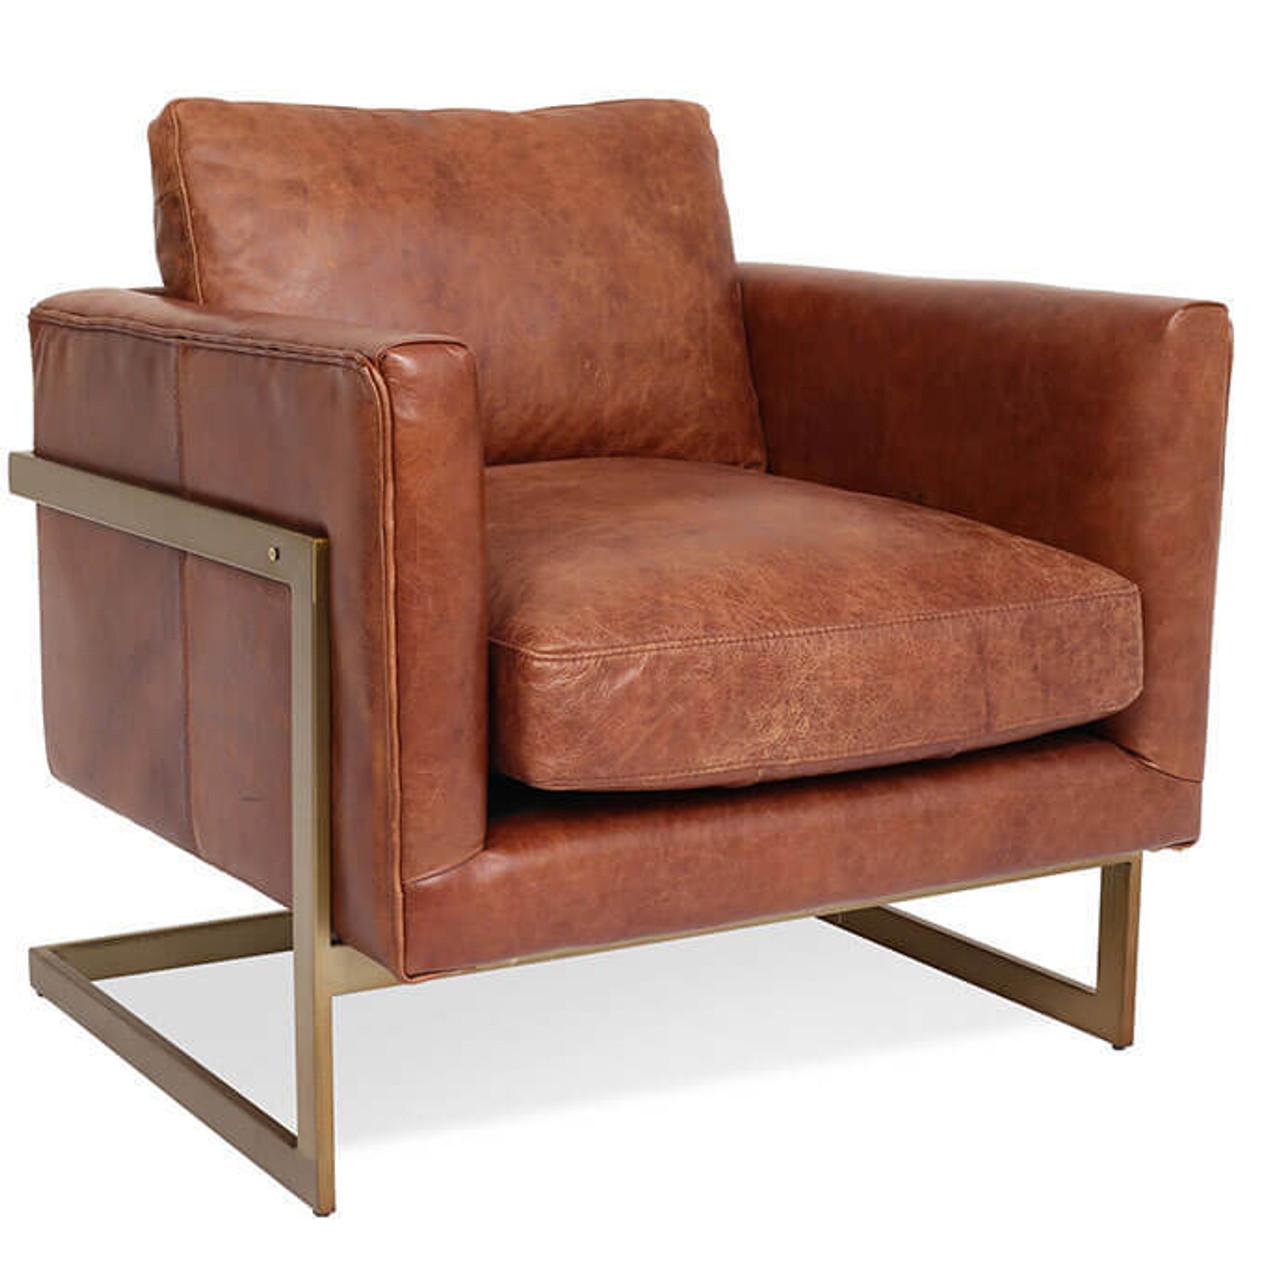 Charmant London Modern Cognac Leather Club Chair